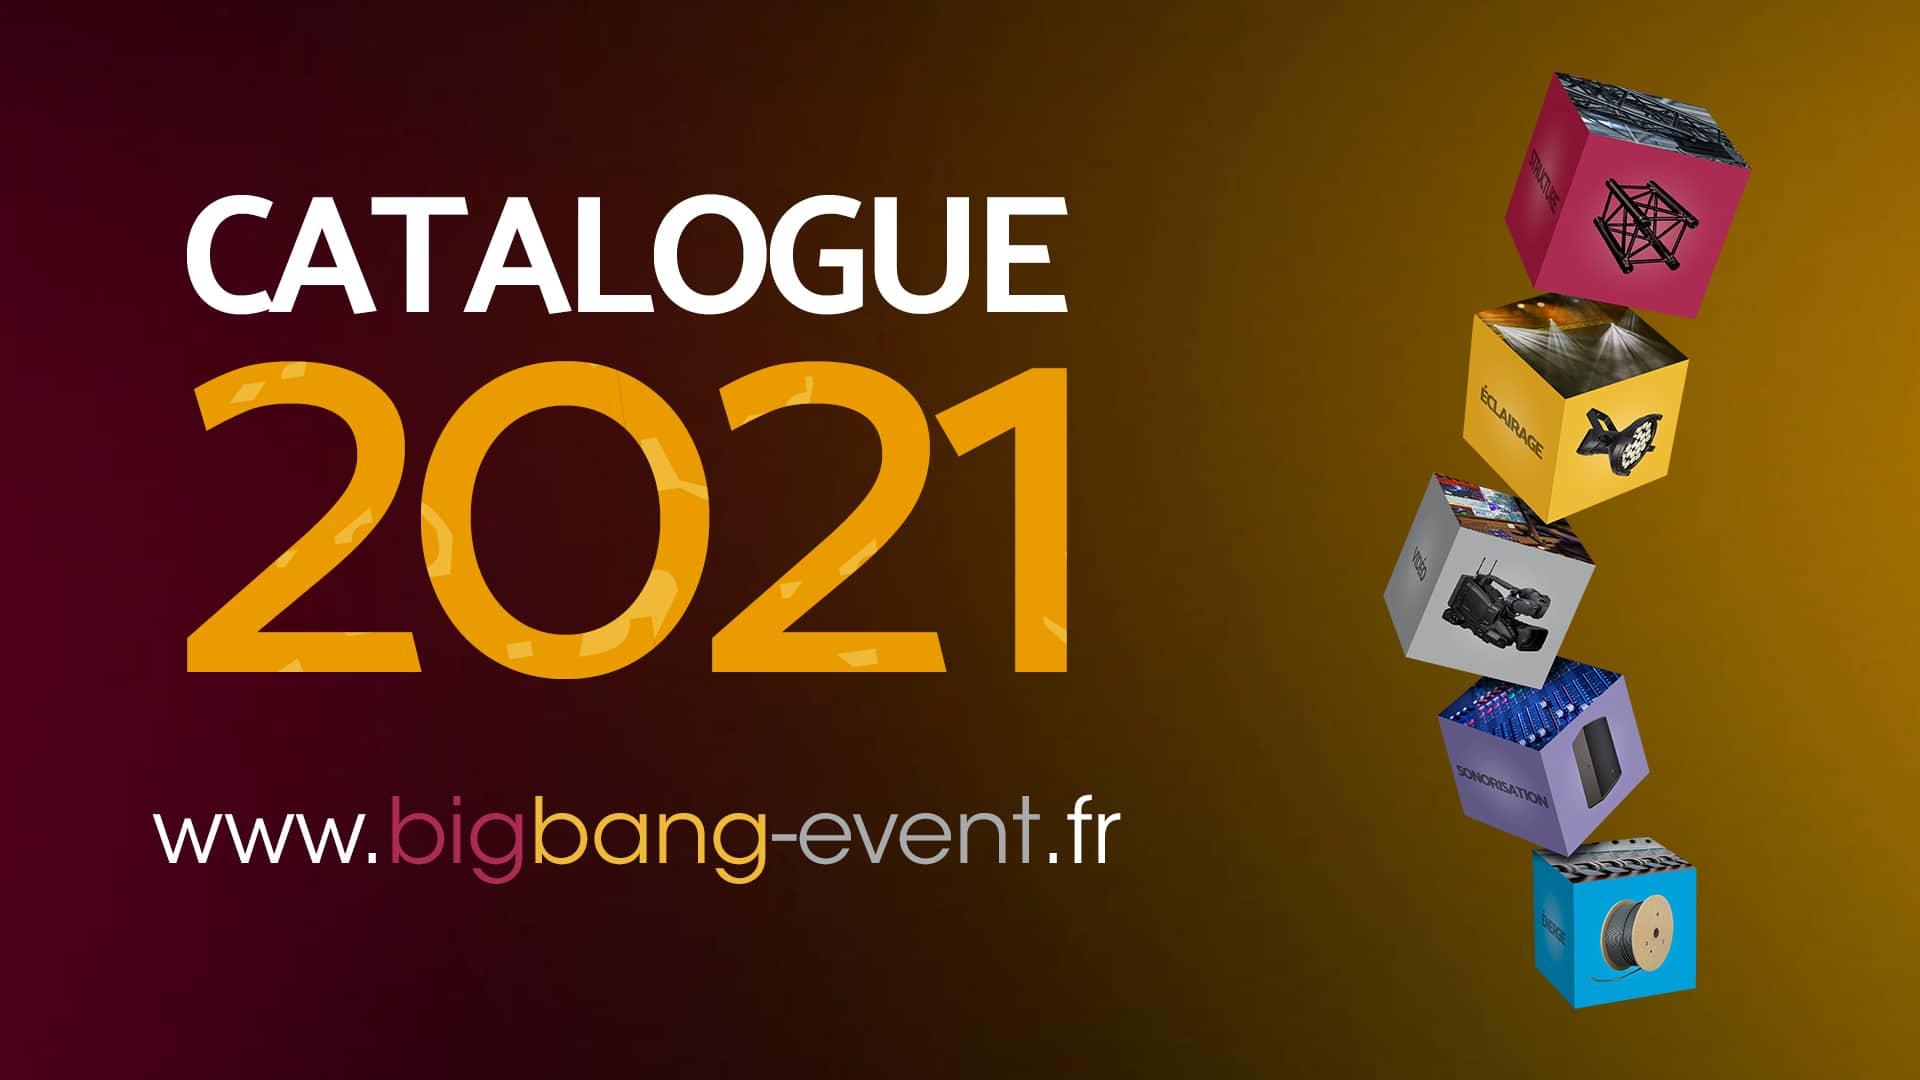 Couverture Catalogue 2021 - Big Bang Event